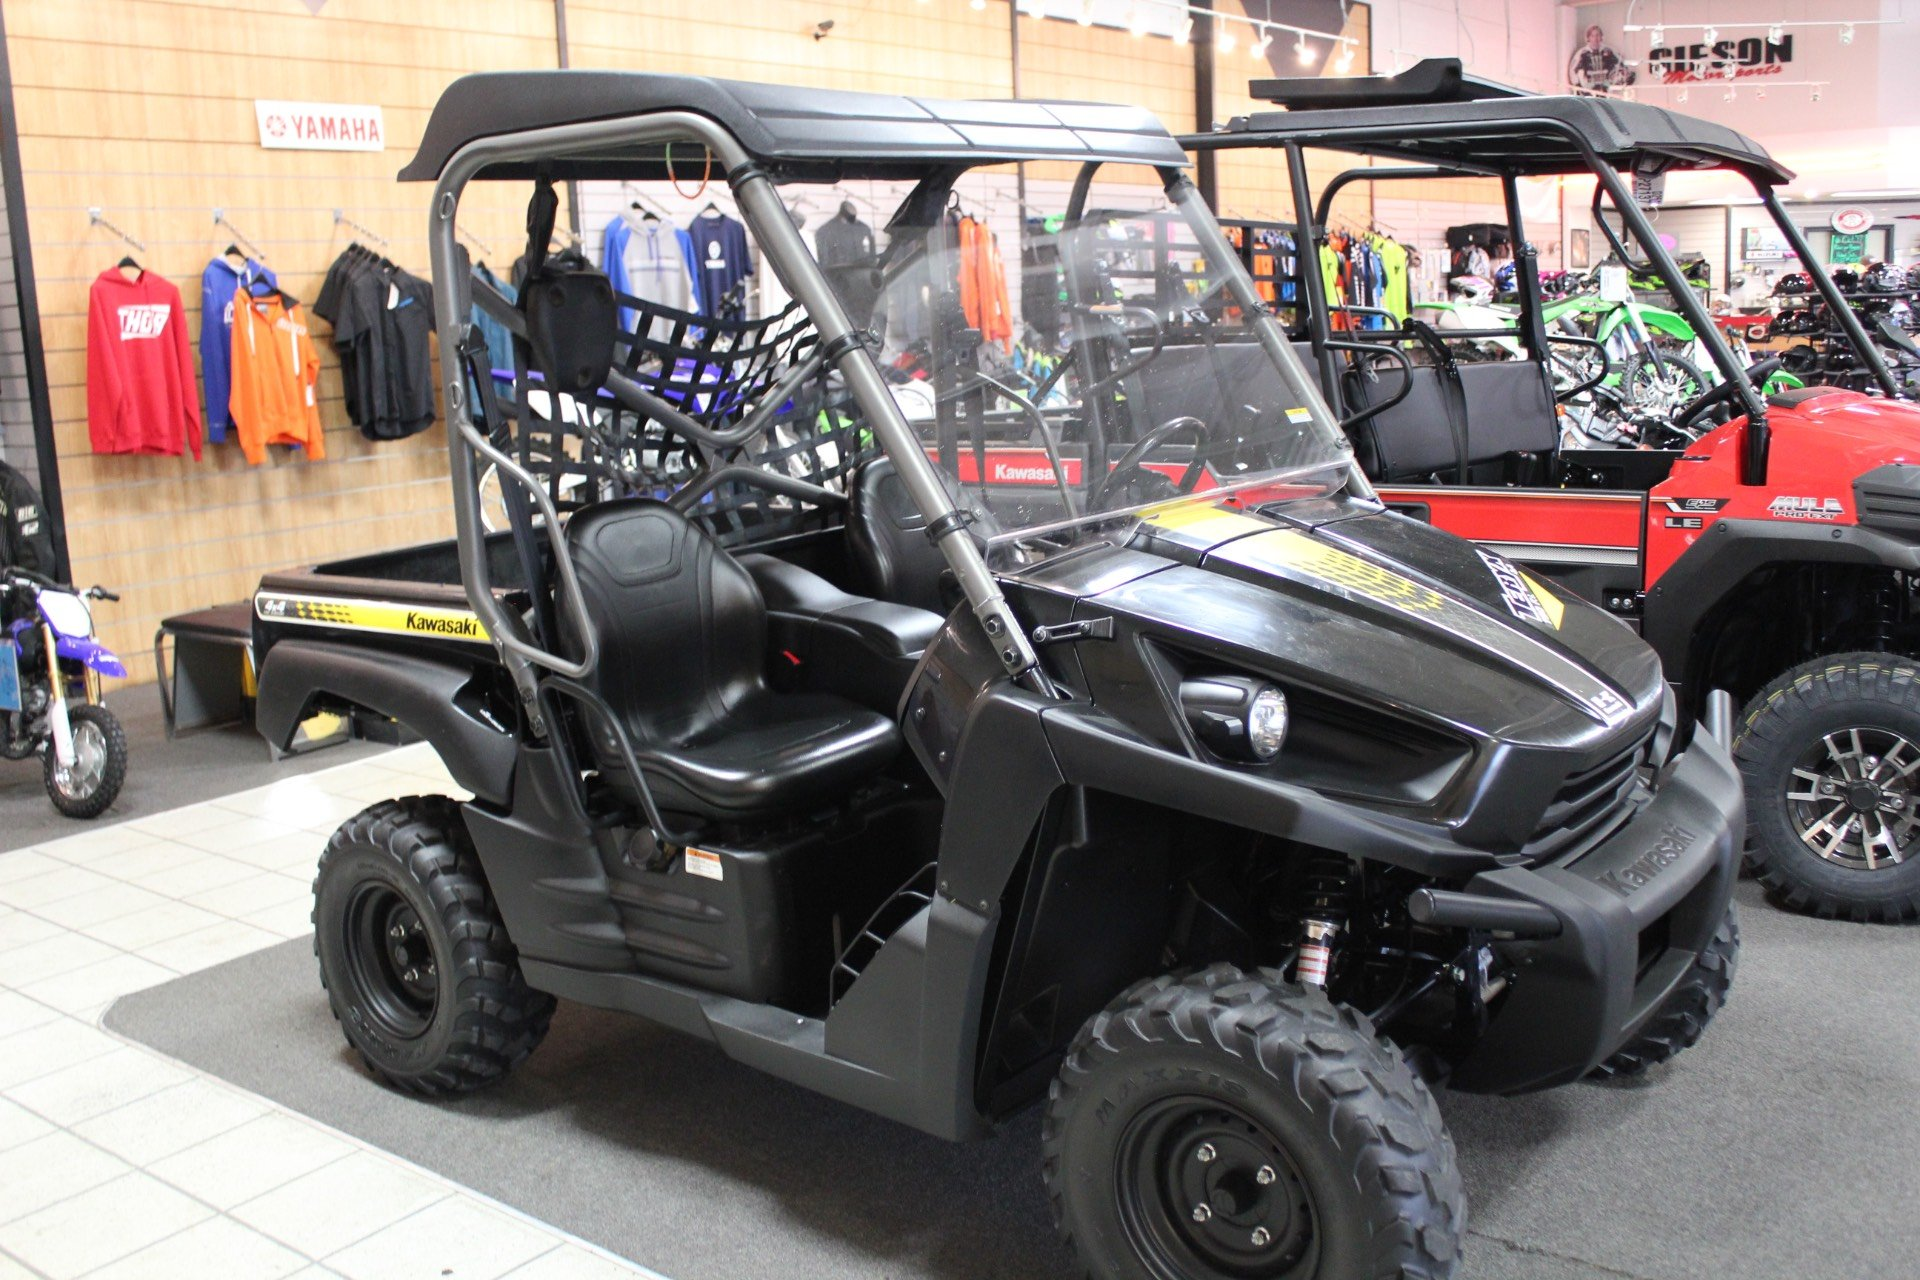 2013 Teryx 750 FI 4x4